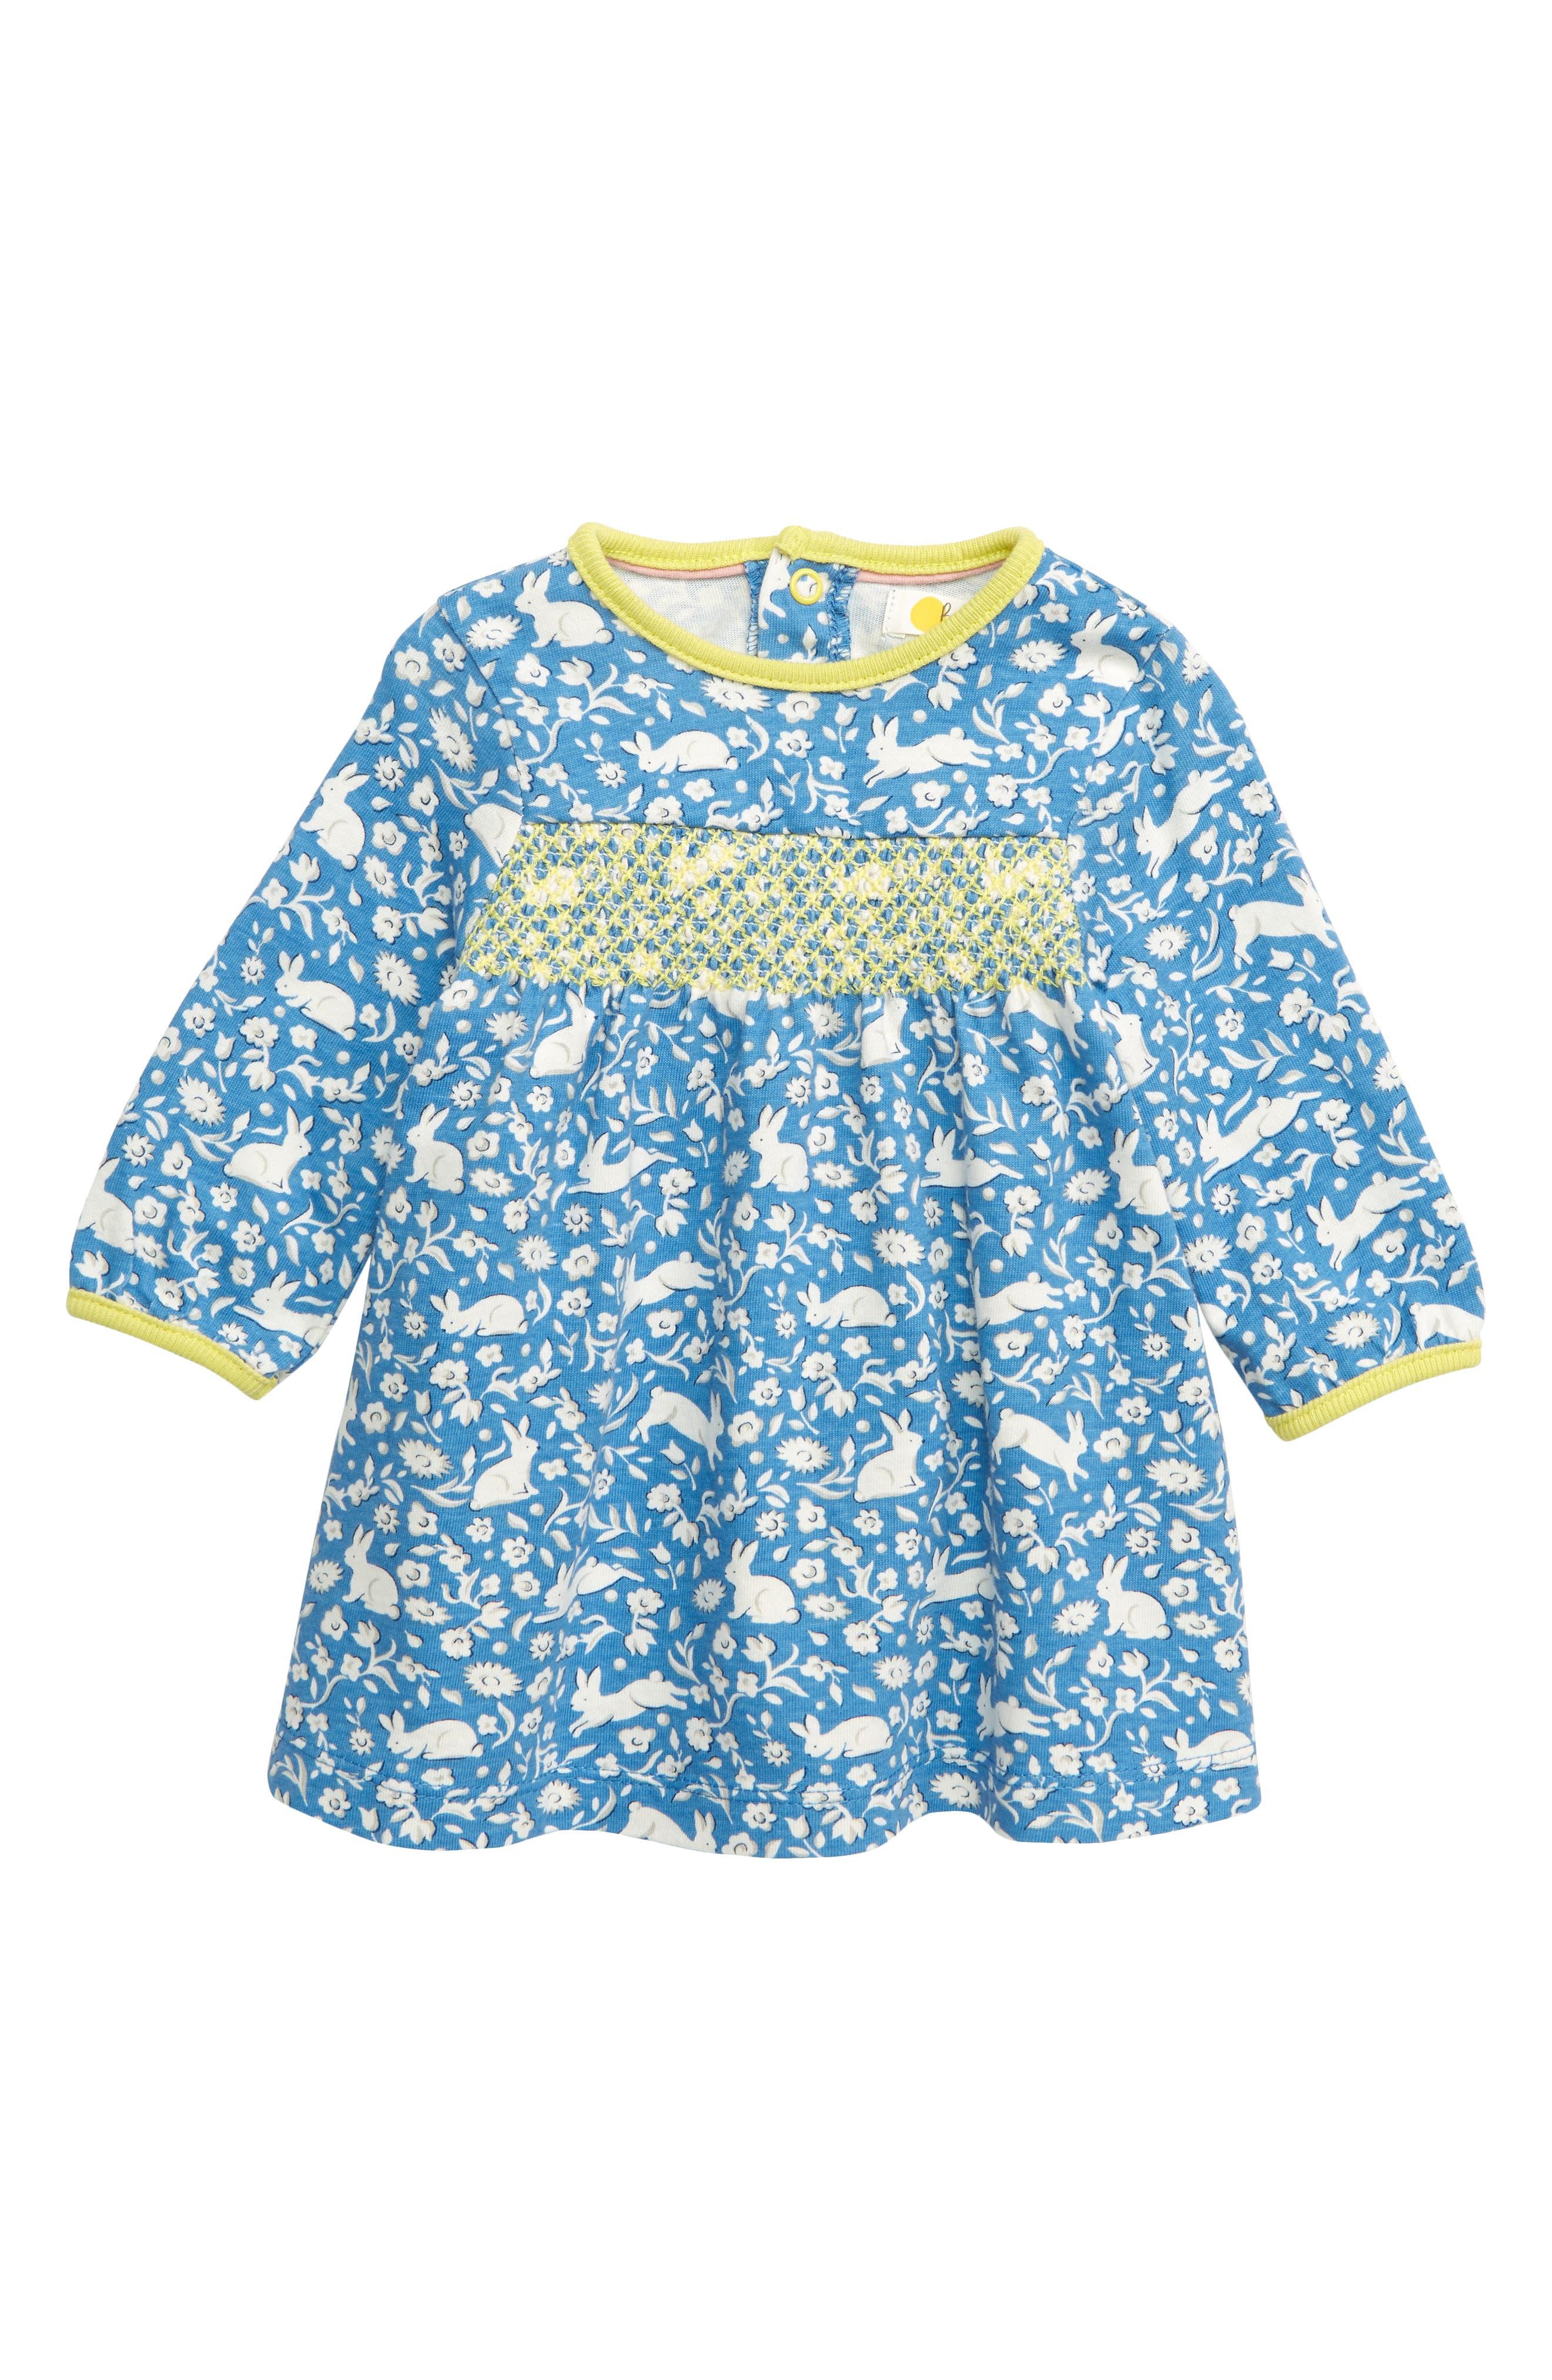 MINI BODEN, Pretty Smocked Jersey Dress, Main thumbnail 1, color, ELIZABETH BLUE WILD BUNNIES